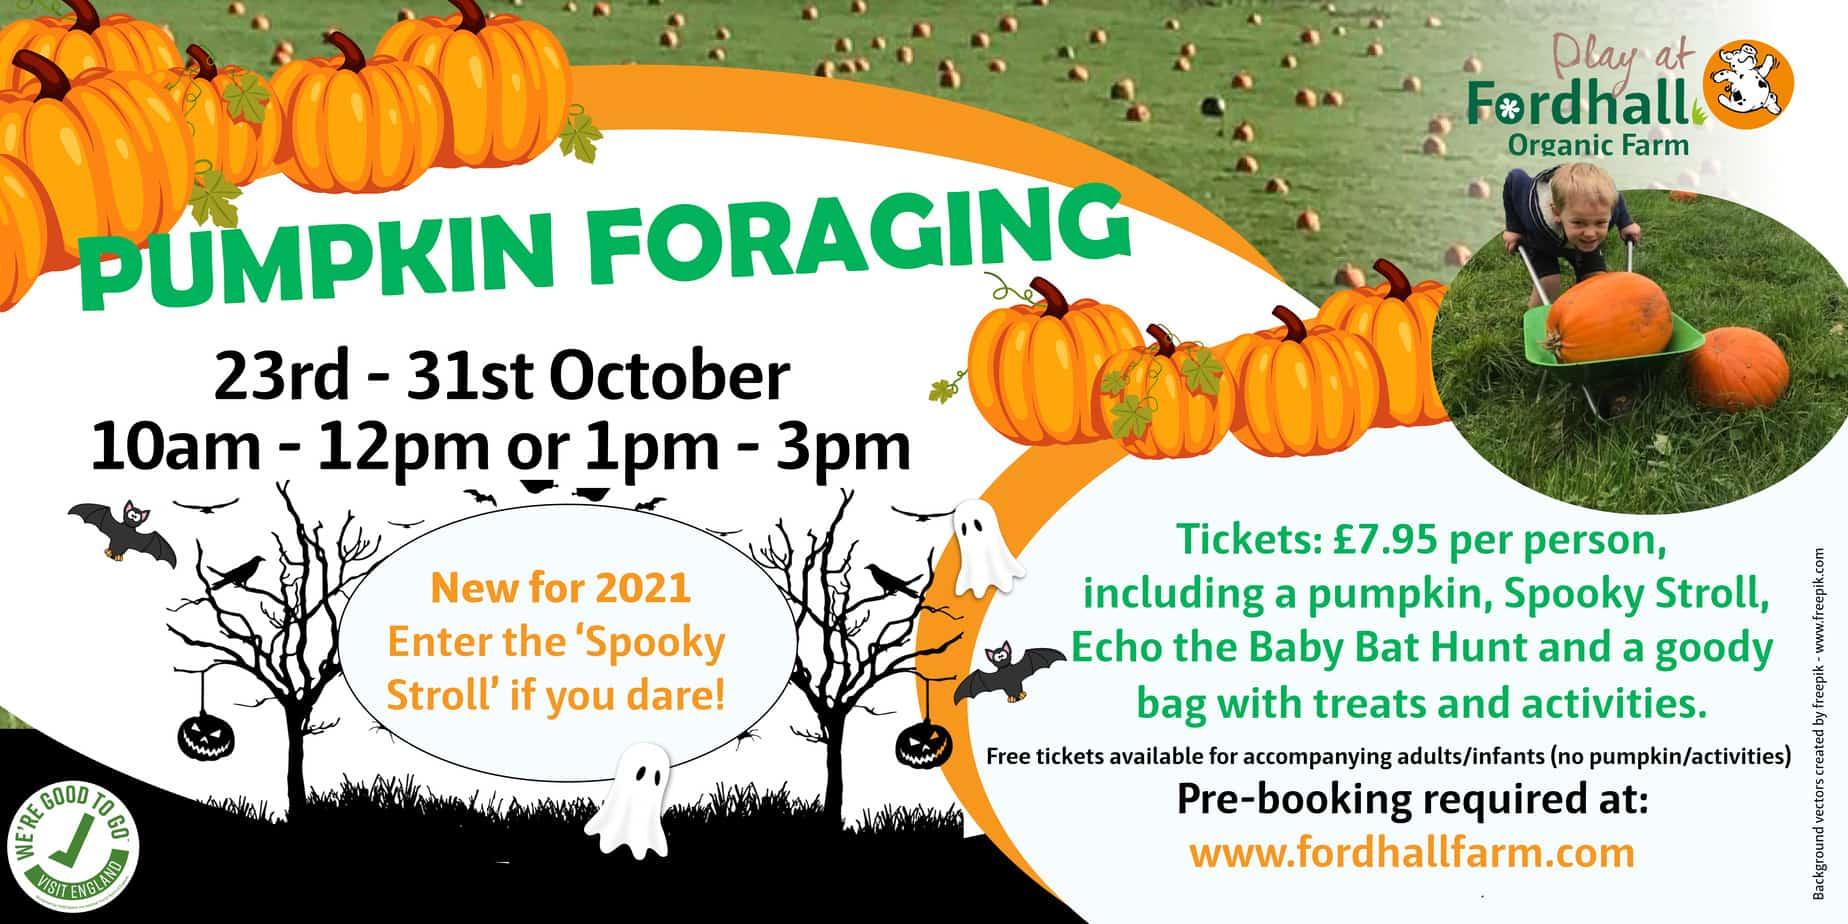 Pumpkin Foraging Shropshire Farm 2021